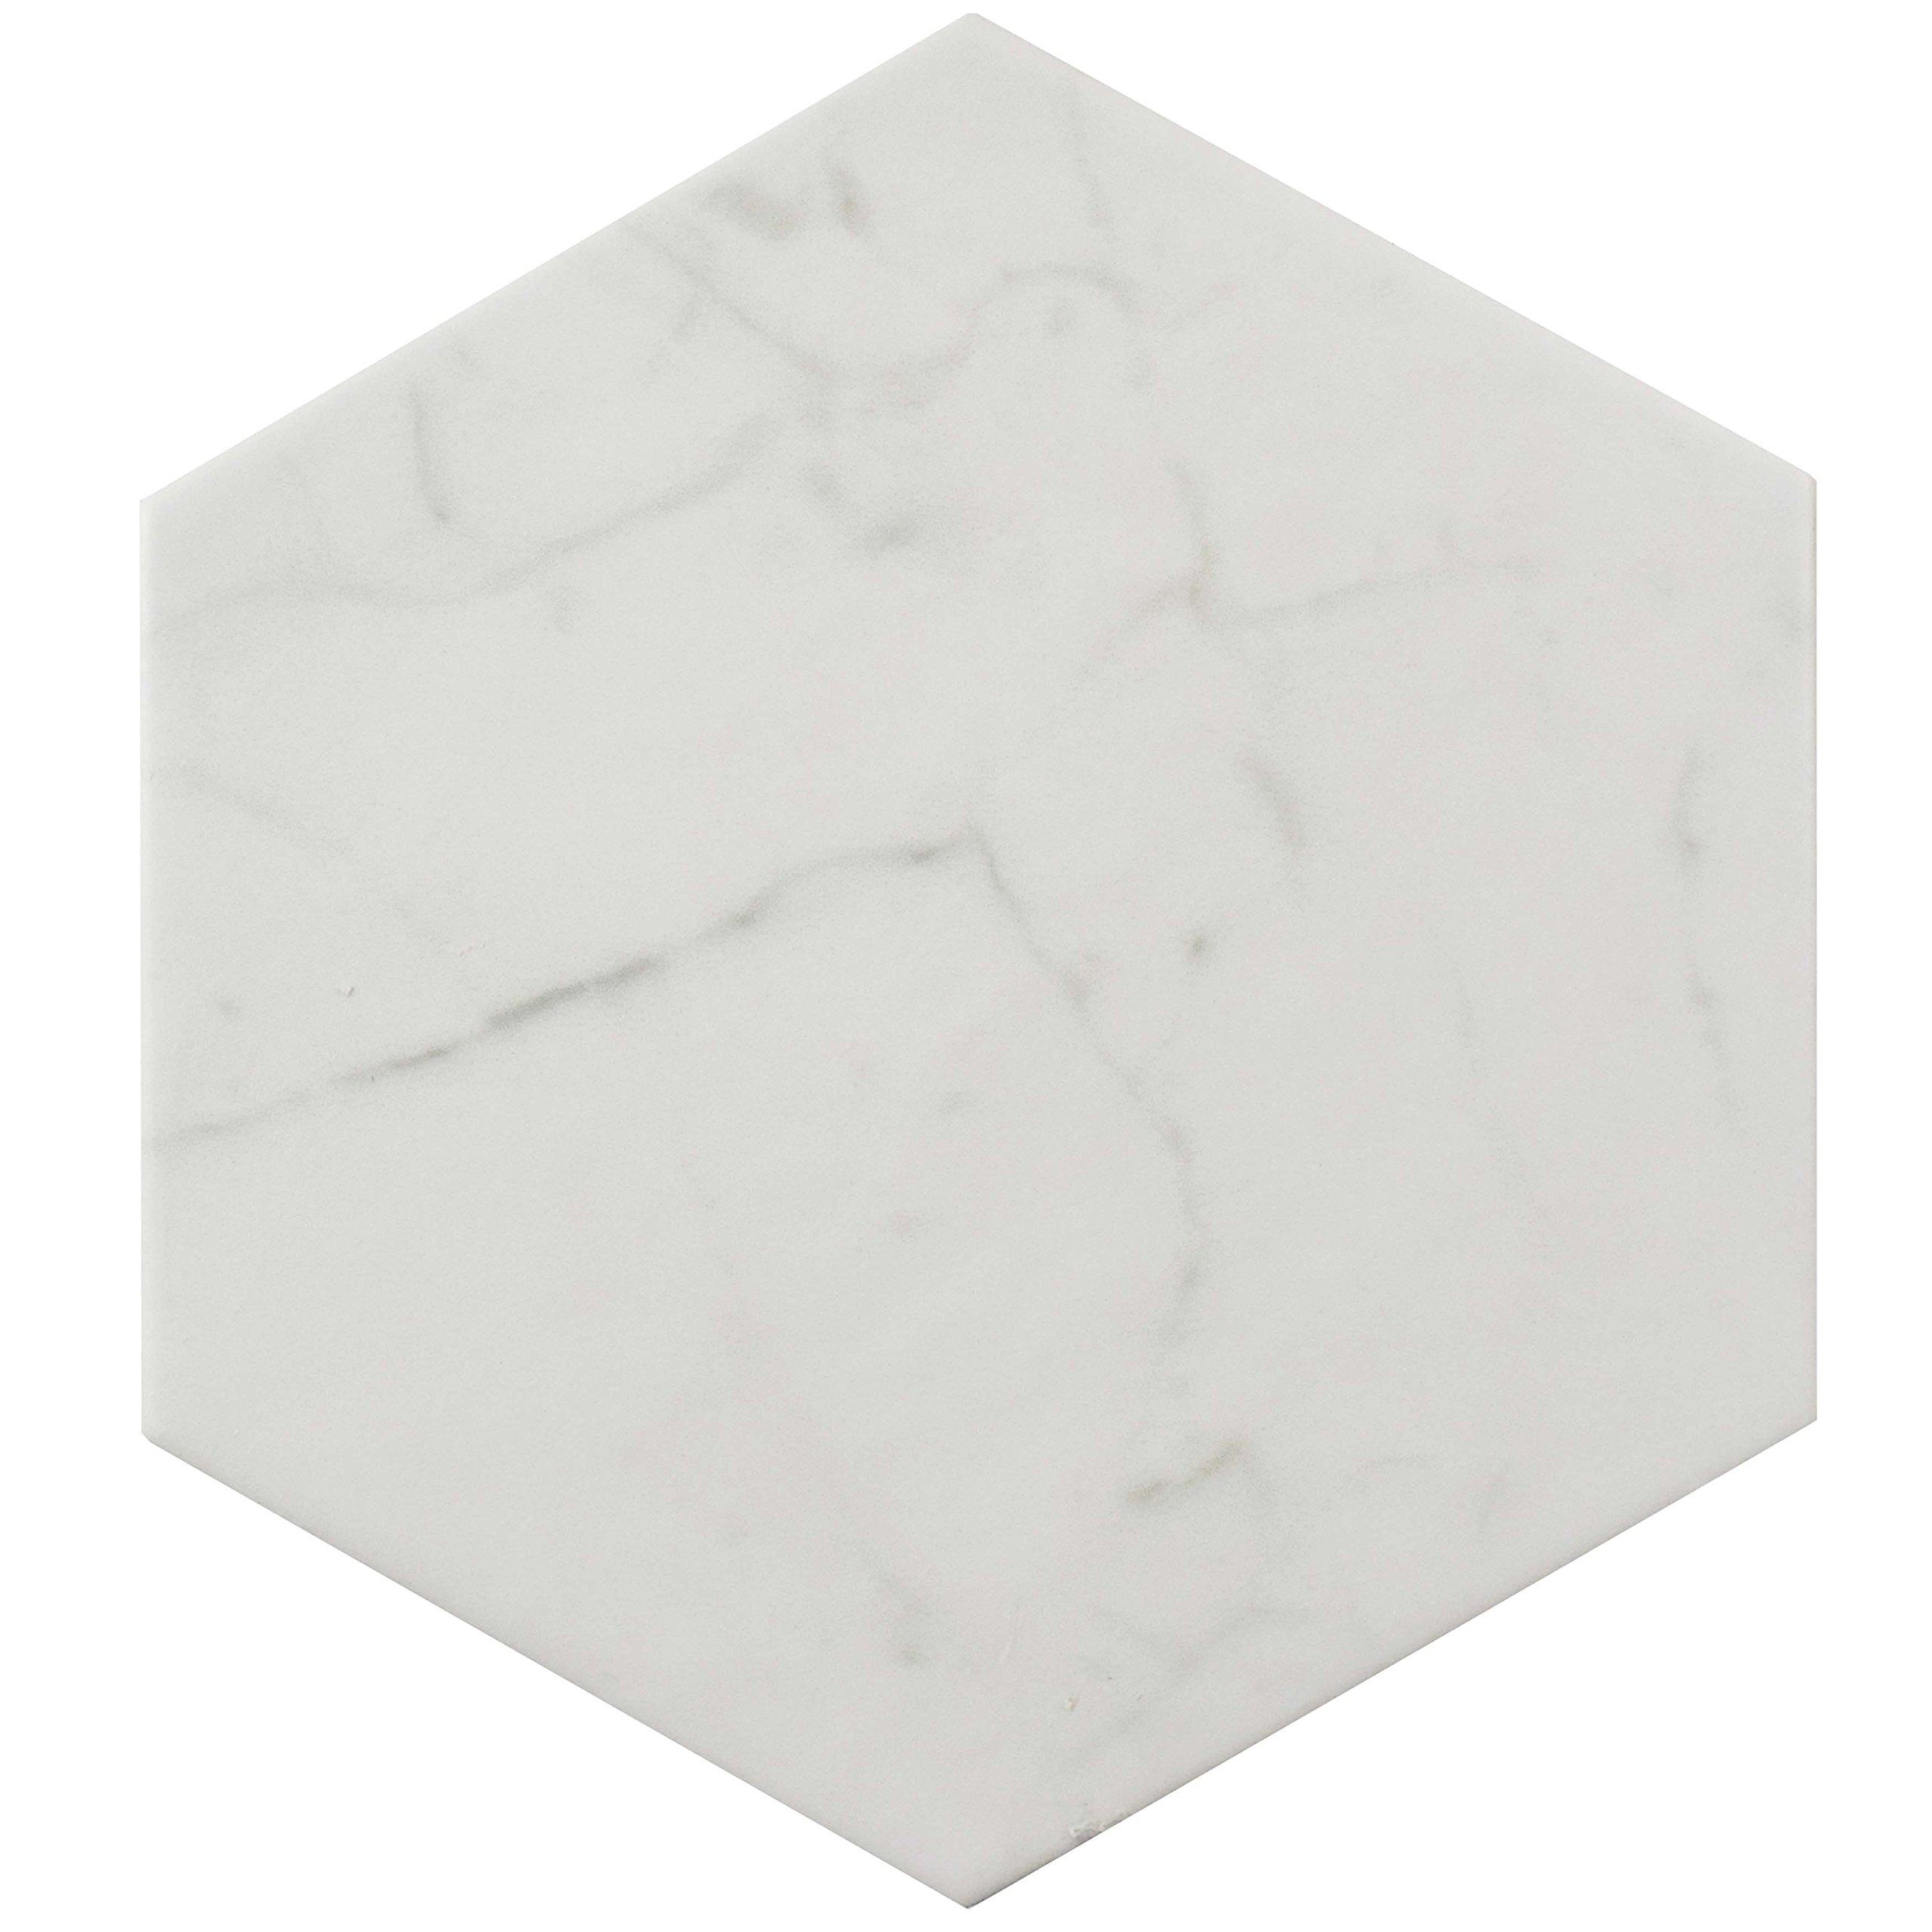 SomerTile FEQCRX Murmur Carrara Hexagon Porcelain Floor & Wall Tile, 7'' x 8'' (Pack of 25) by SOMERTILE (Image #2)